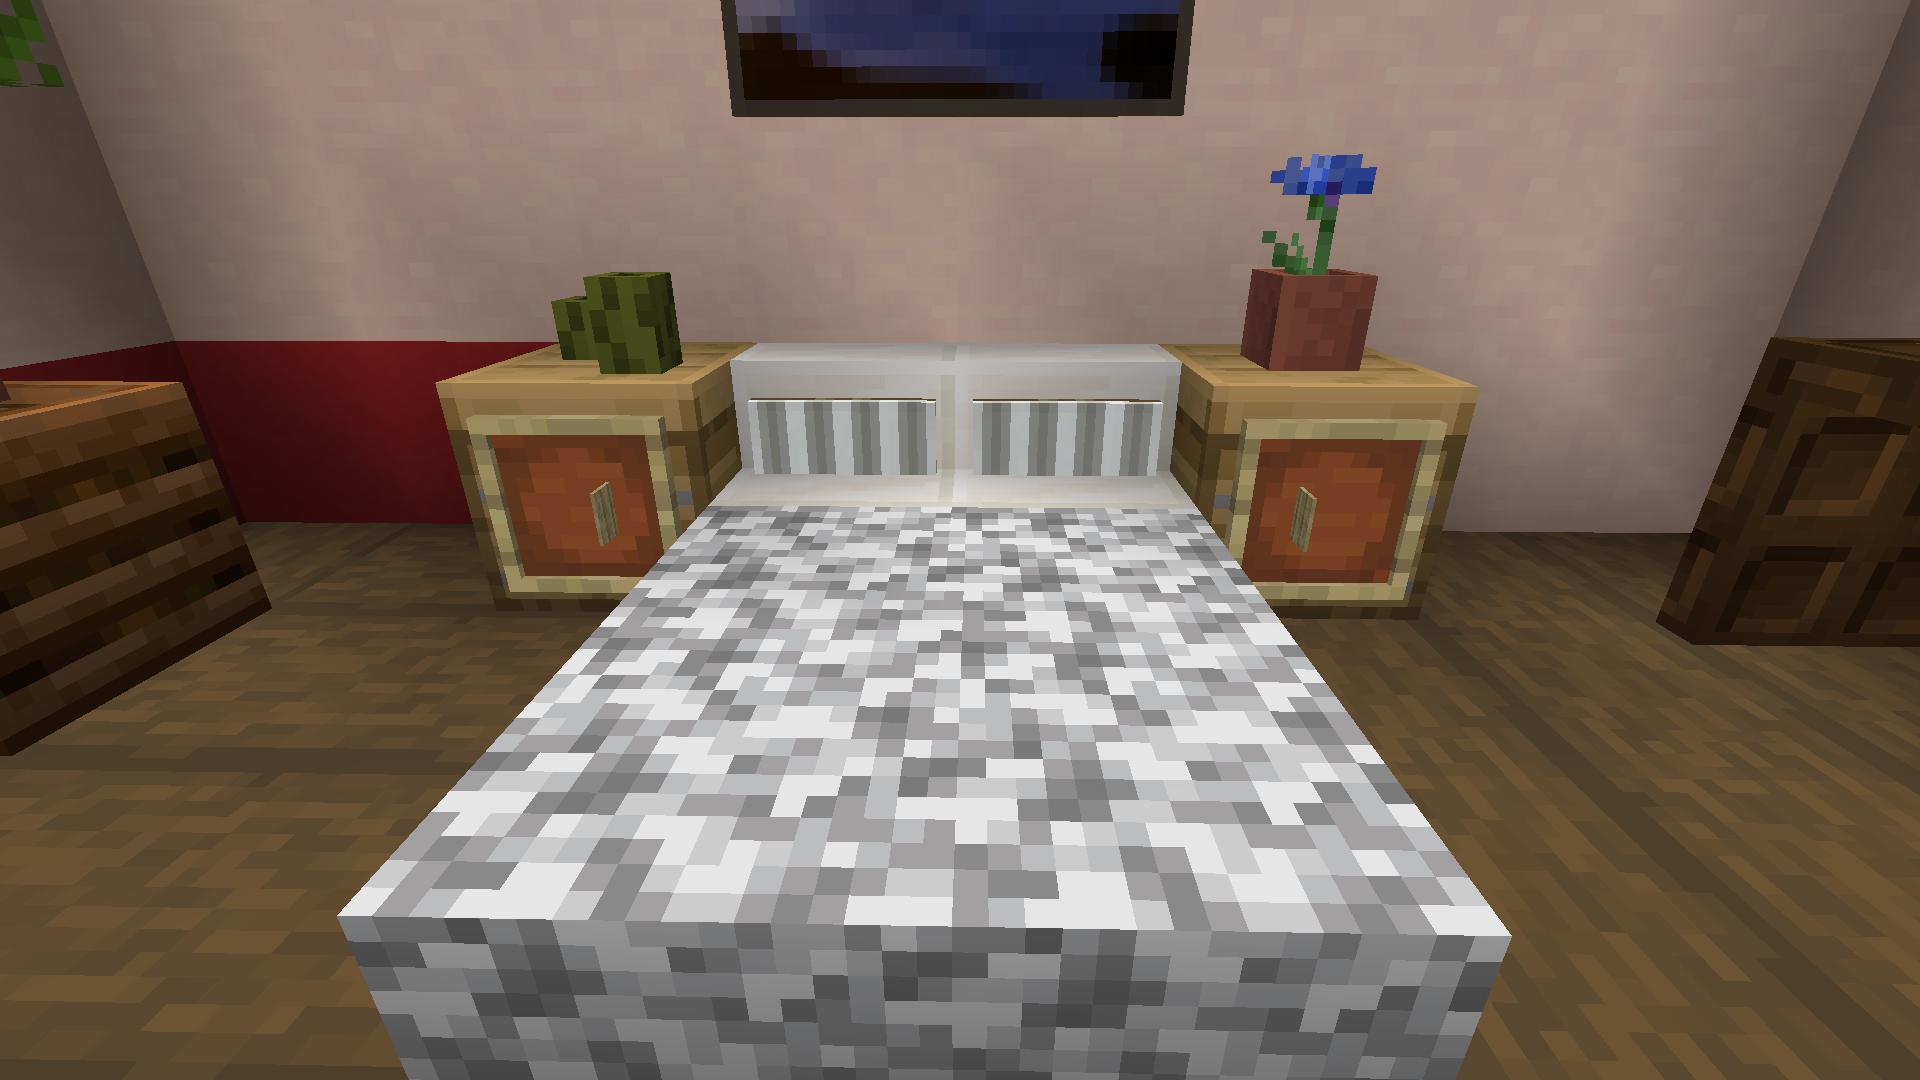 Bedside Cabinets - Minecraft Furniture